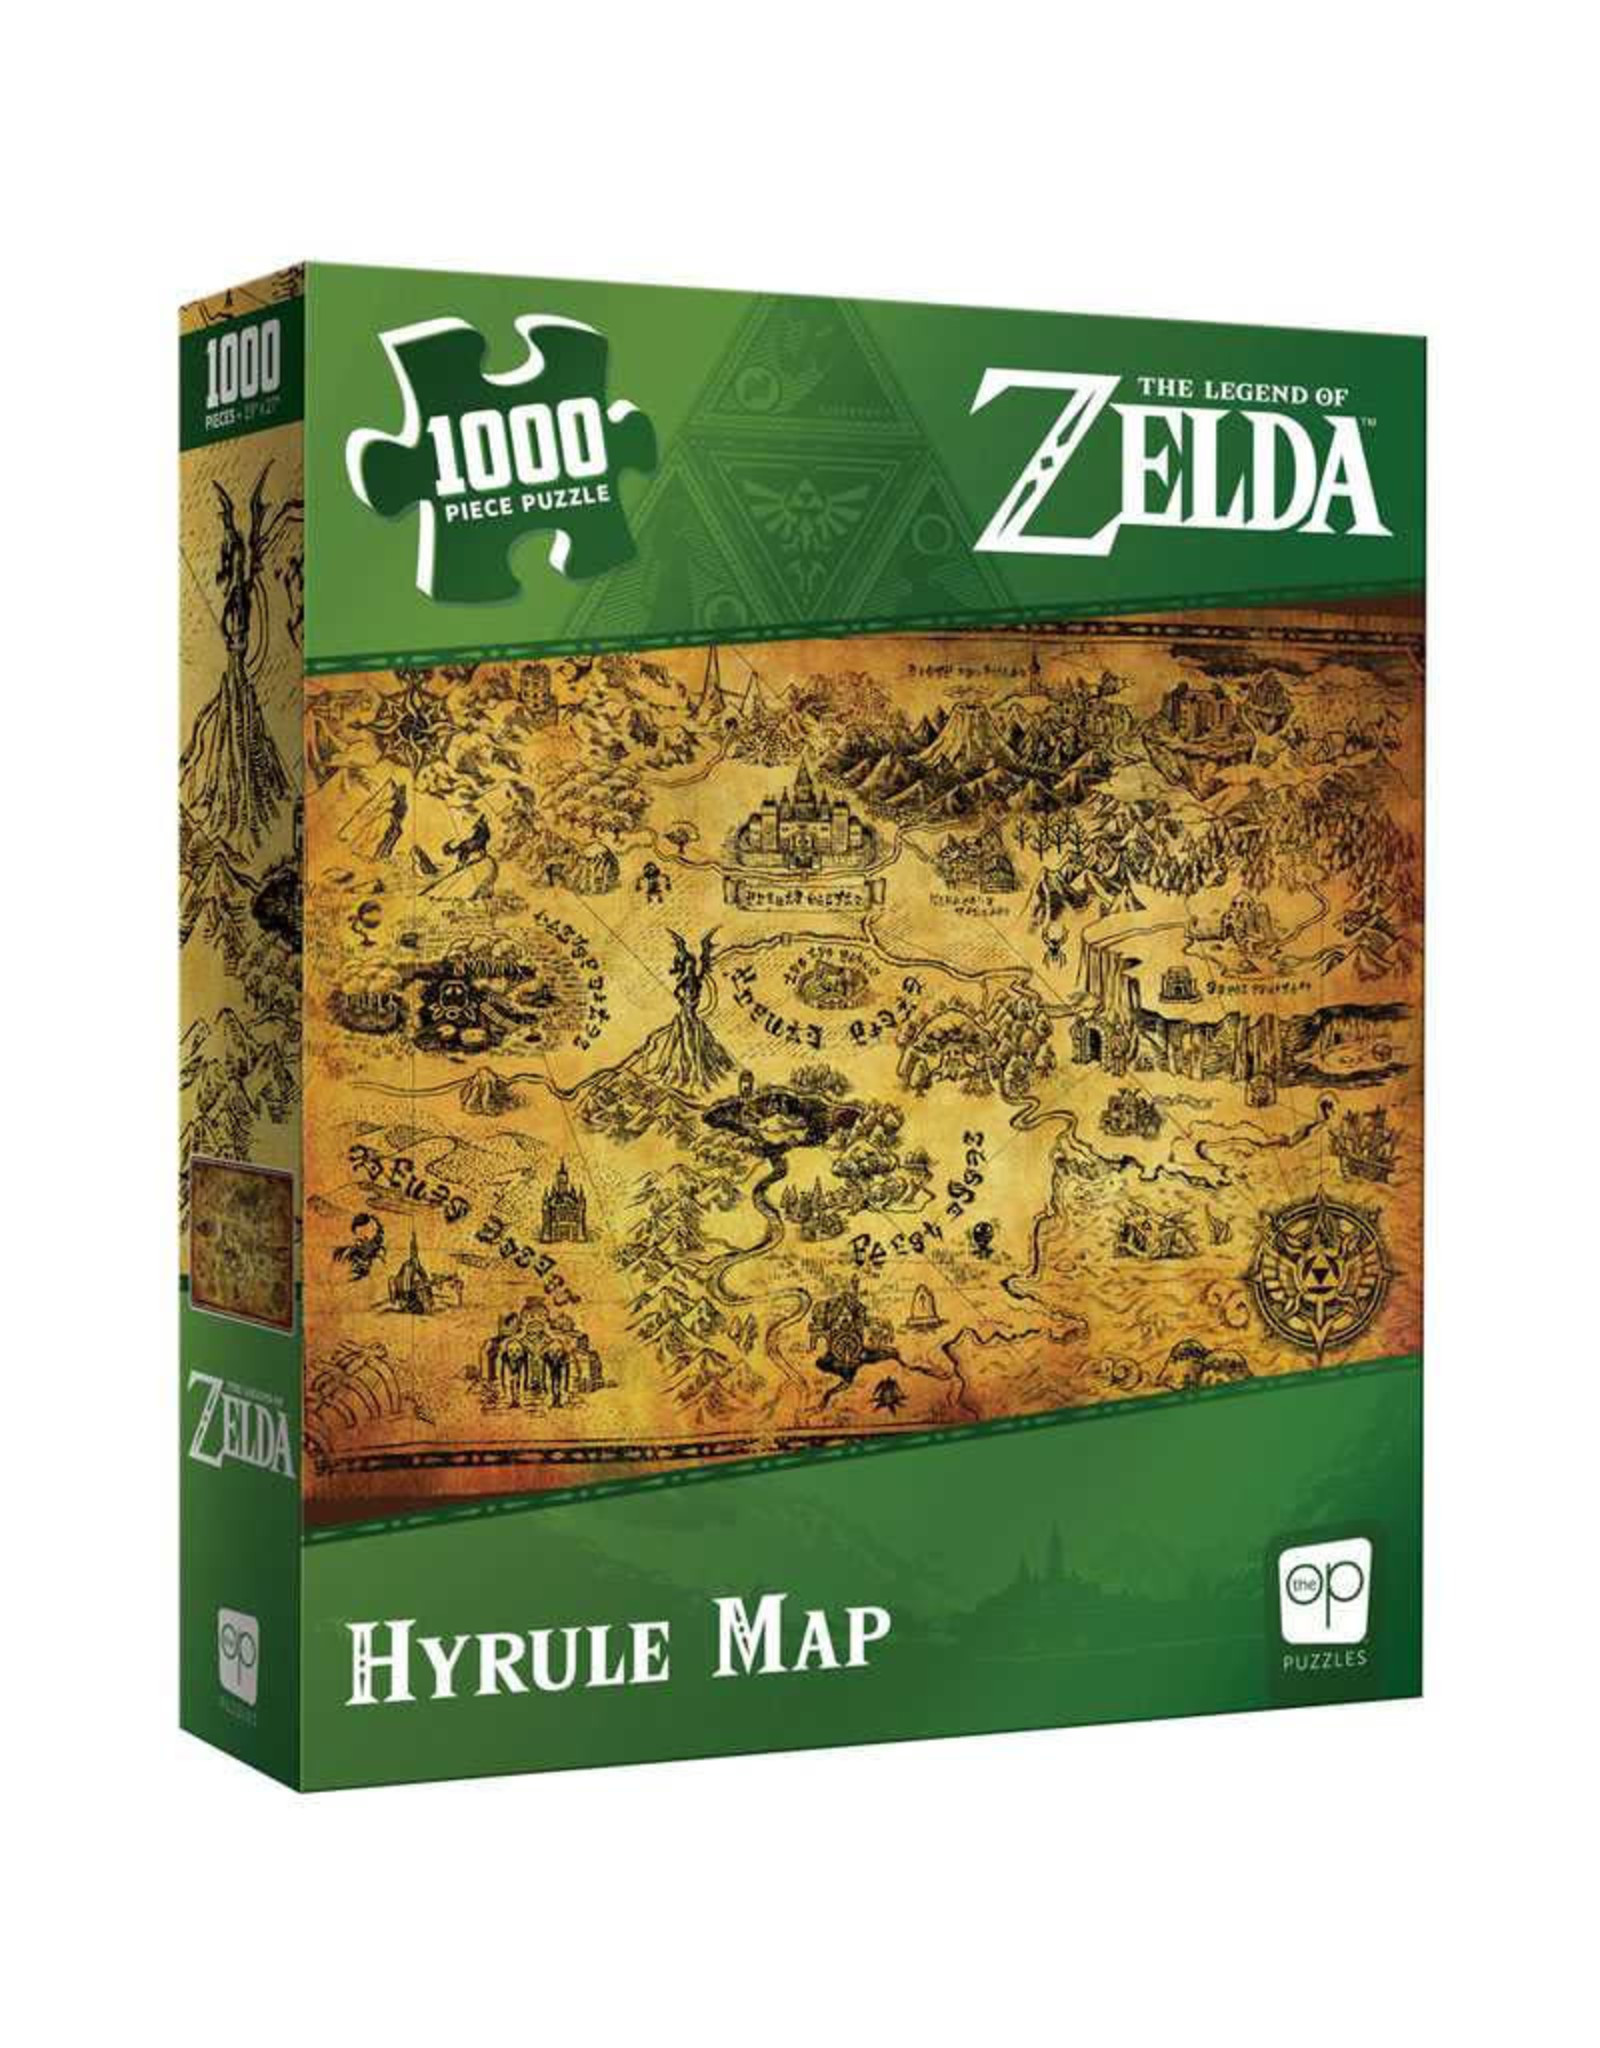 USAopoly Zelda Hyrule Map Puzzle 1000 PCS (Pre-Order)